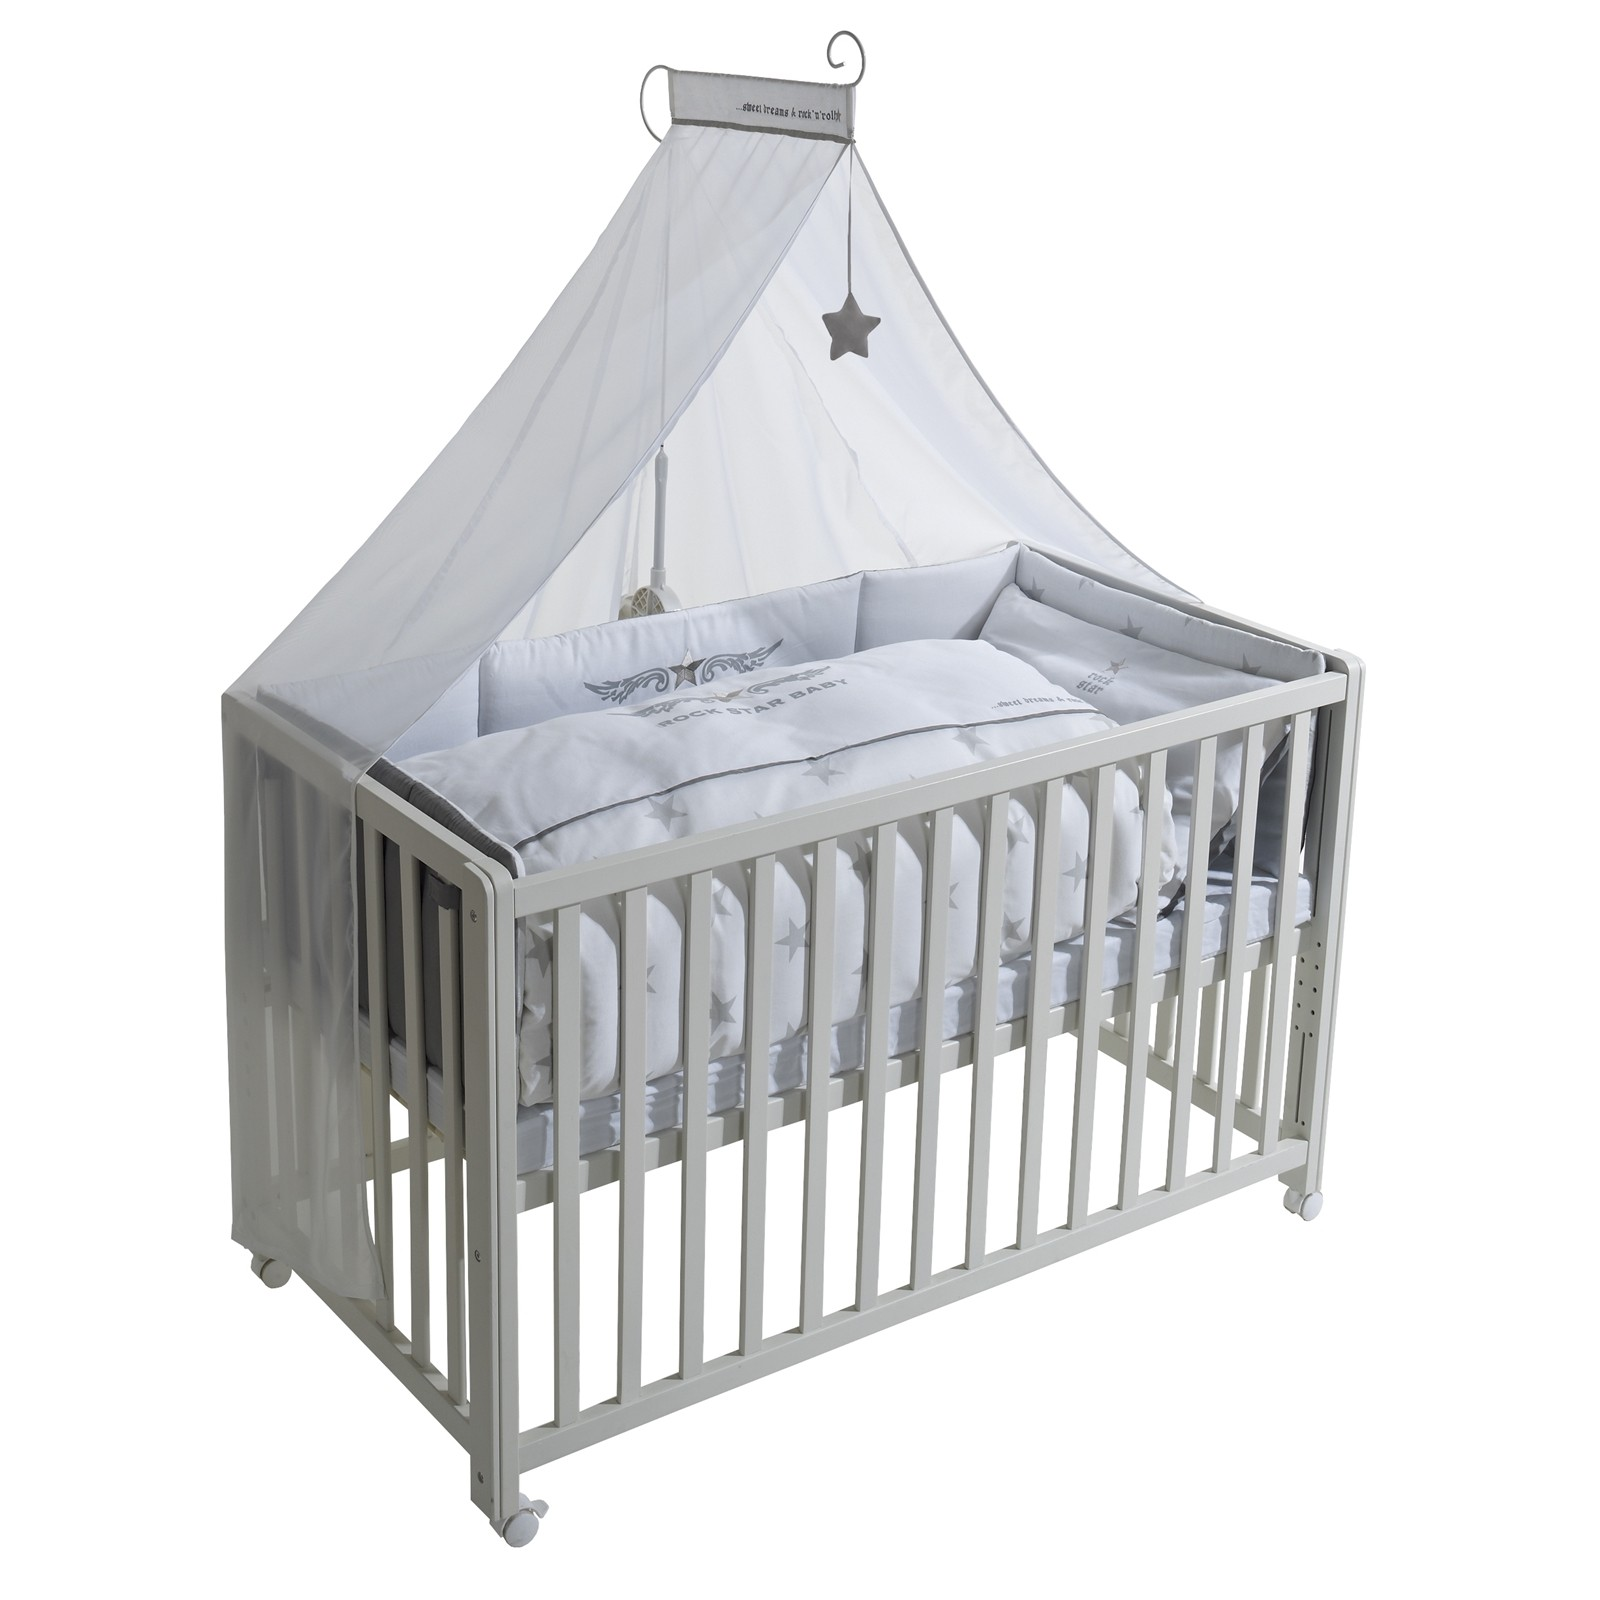 Full Size of Roba Bett Baby Direktde Room Bed Kinderbett Beistellbett Rockstar Betten Bei Ikea Ausklappbares Eiche 2x2m Günstig Antik Einfaches 160x200 Kaufen Hamburg Bett Roba Bett